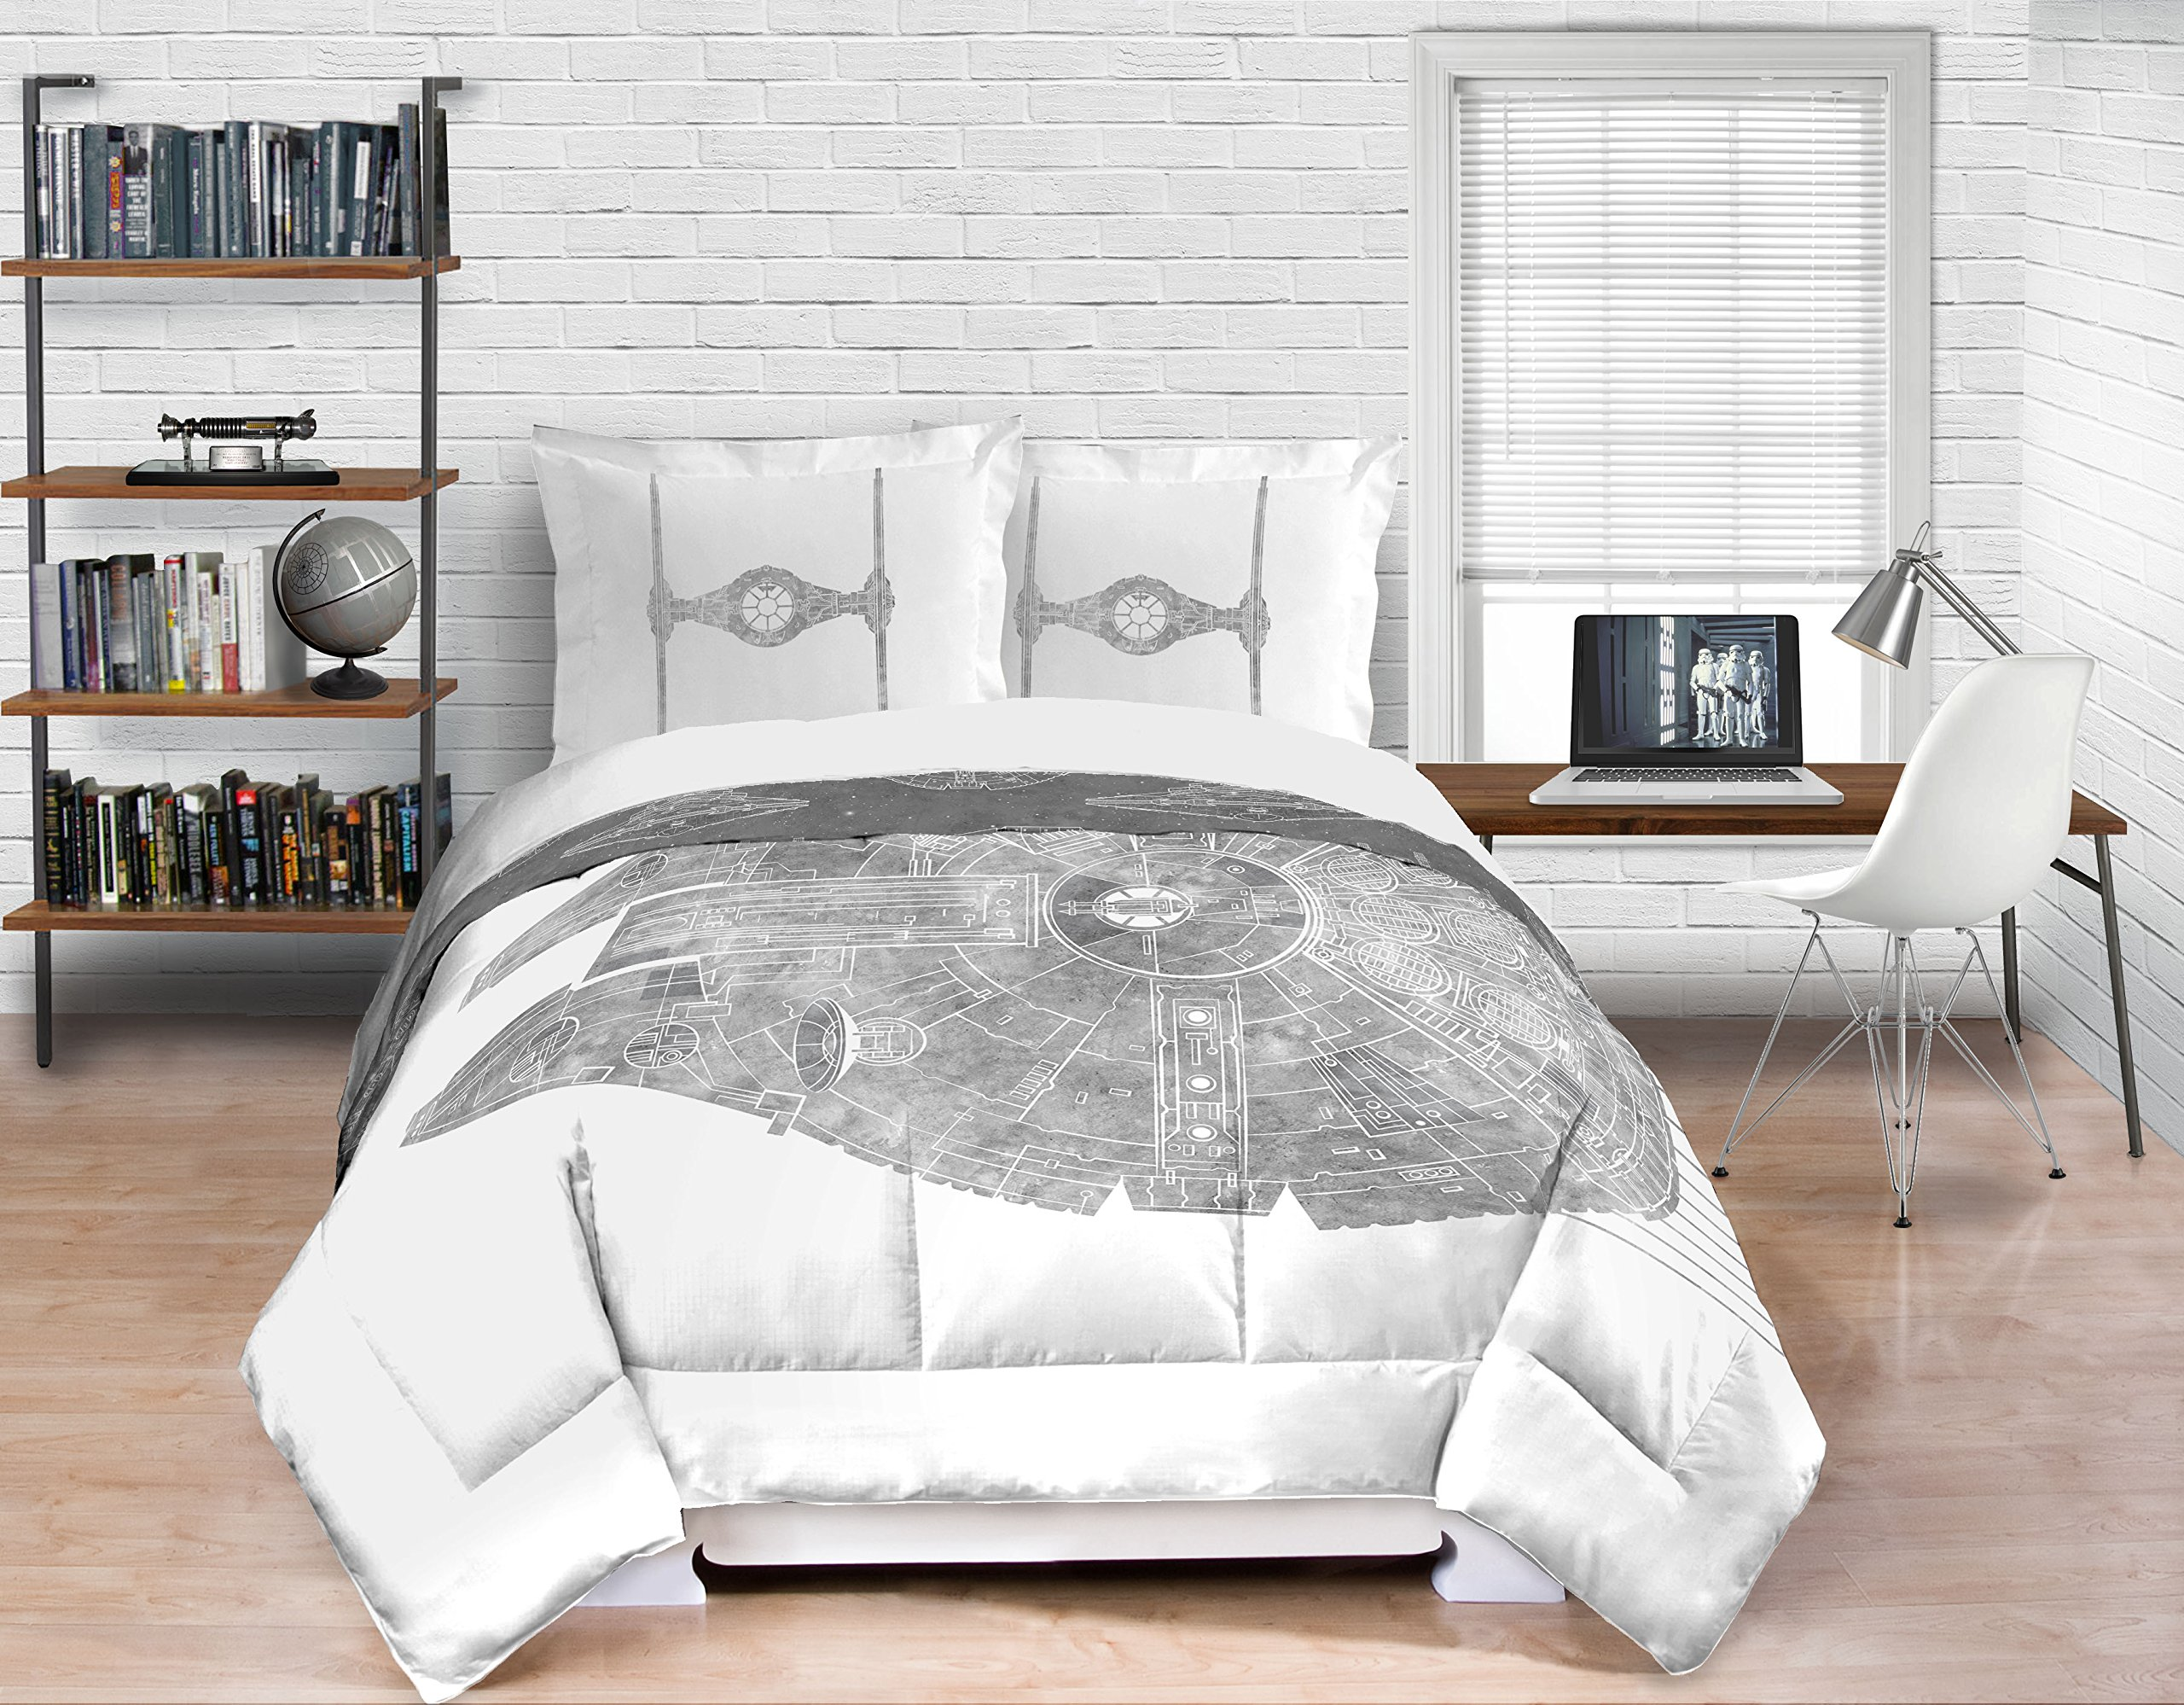 for njteen design full images children youth bedroom set sets of modern home boysunique aesthetic star in boy boys wars teen uk rt made furniture excellent size